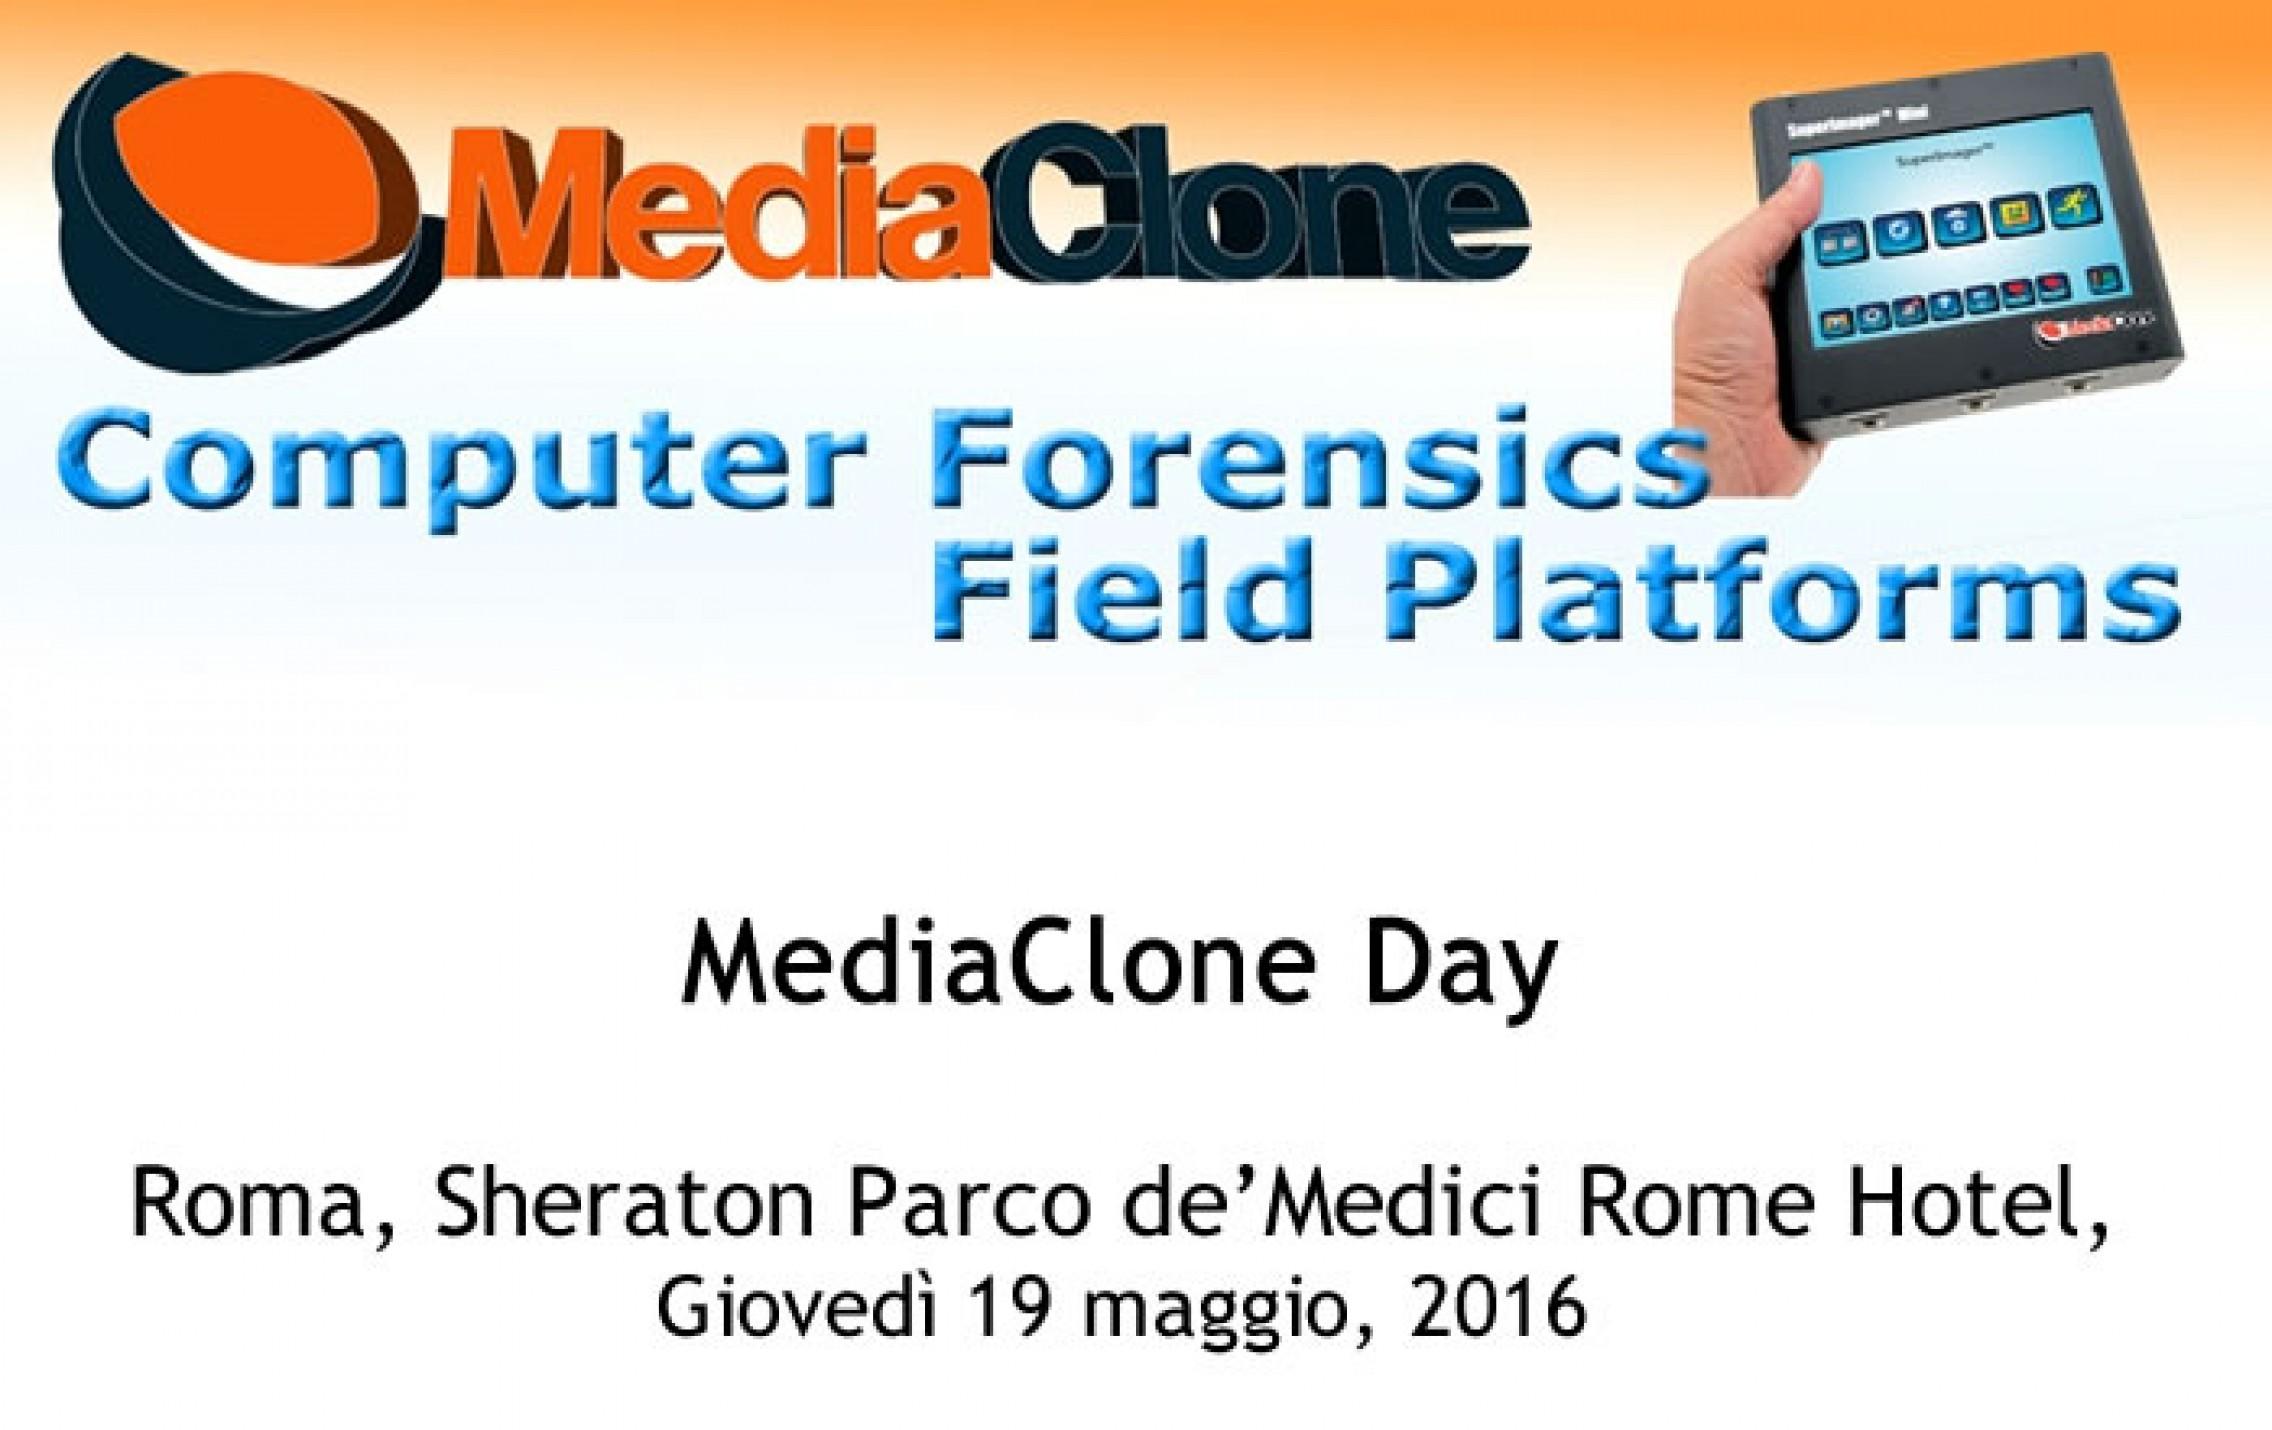 Media clone day